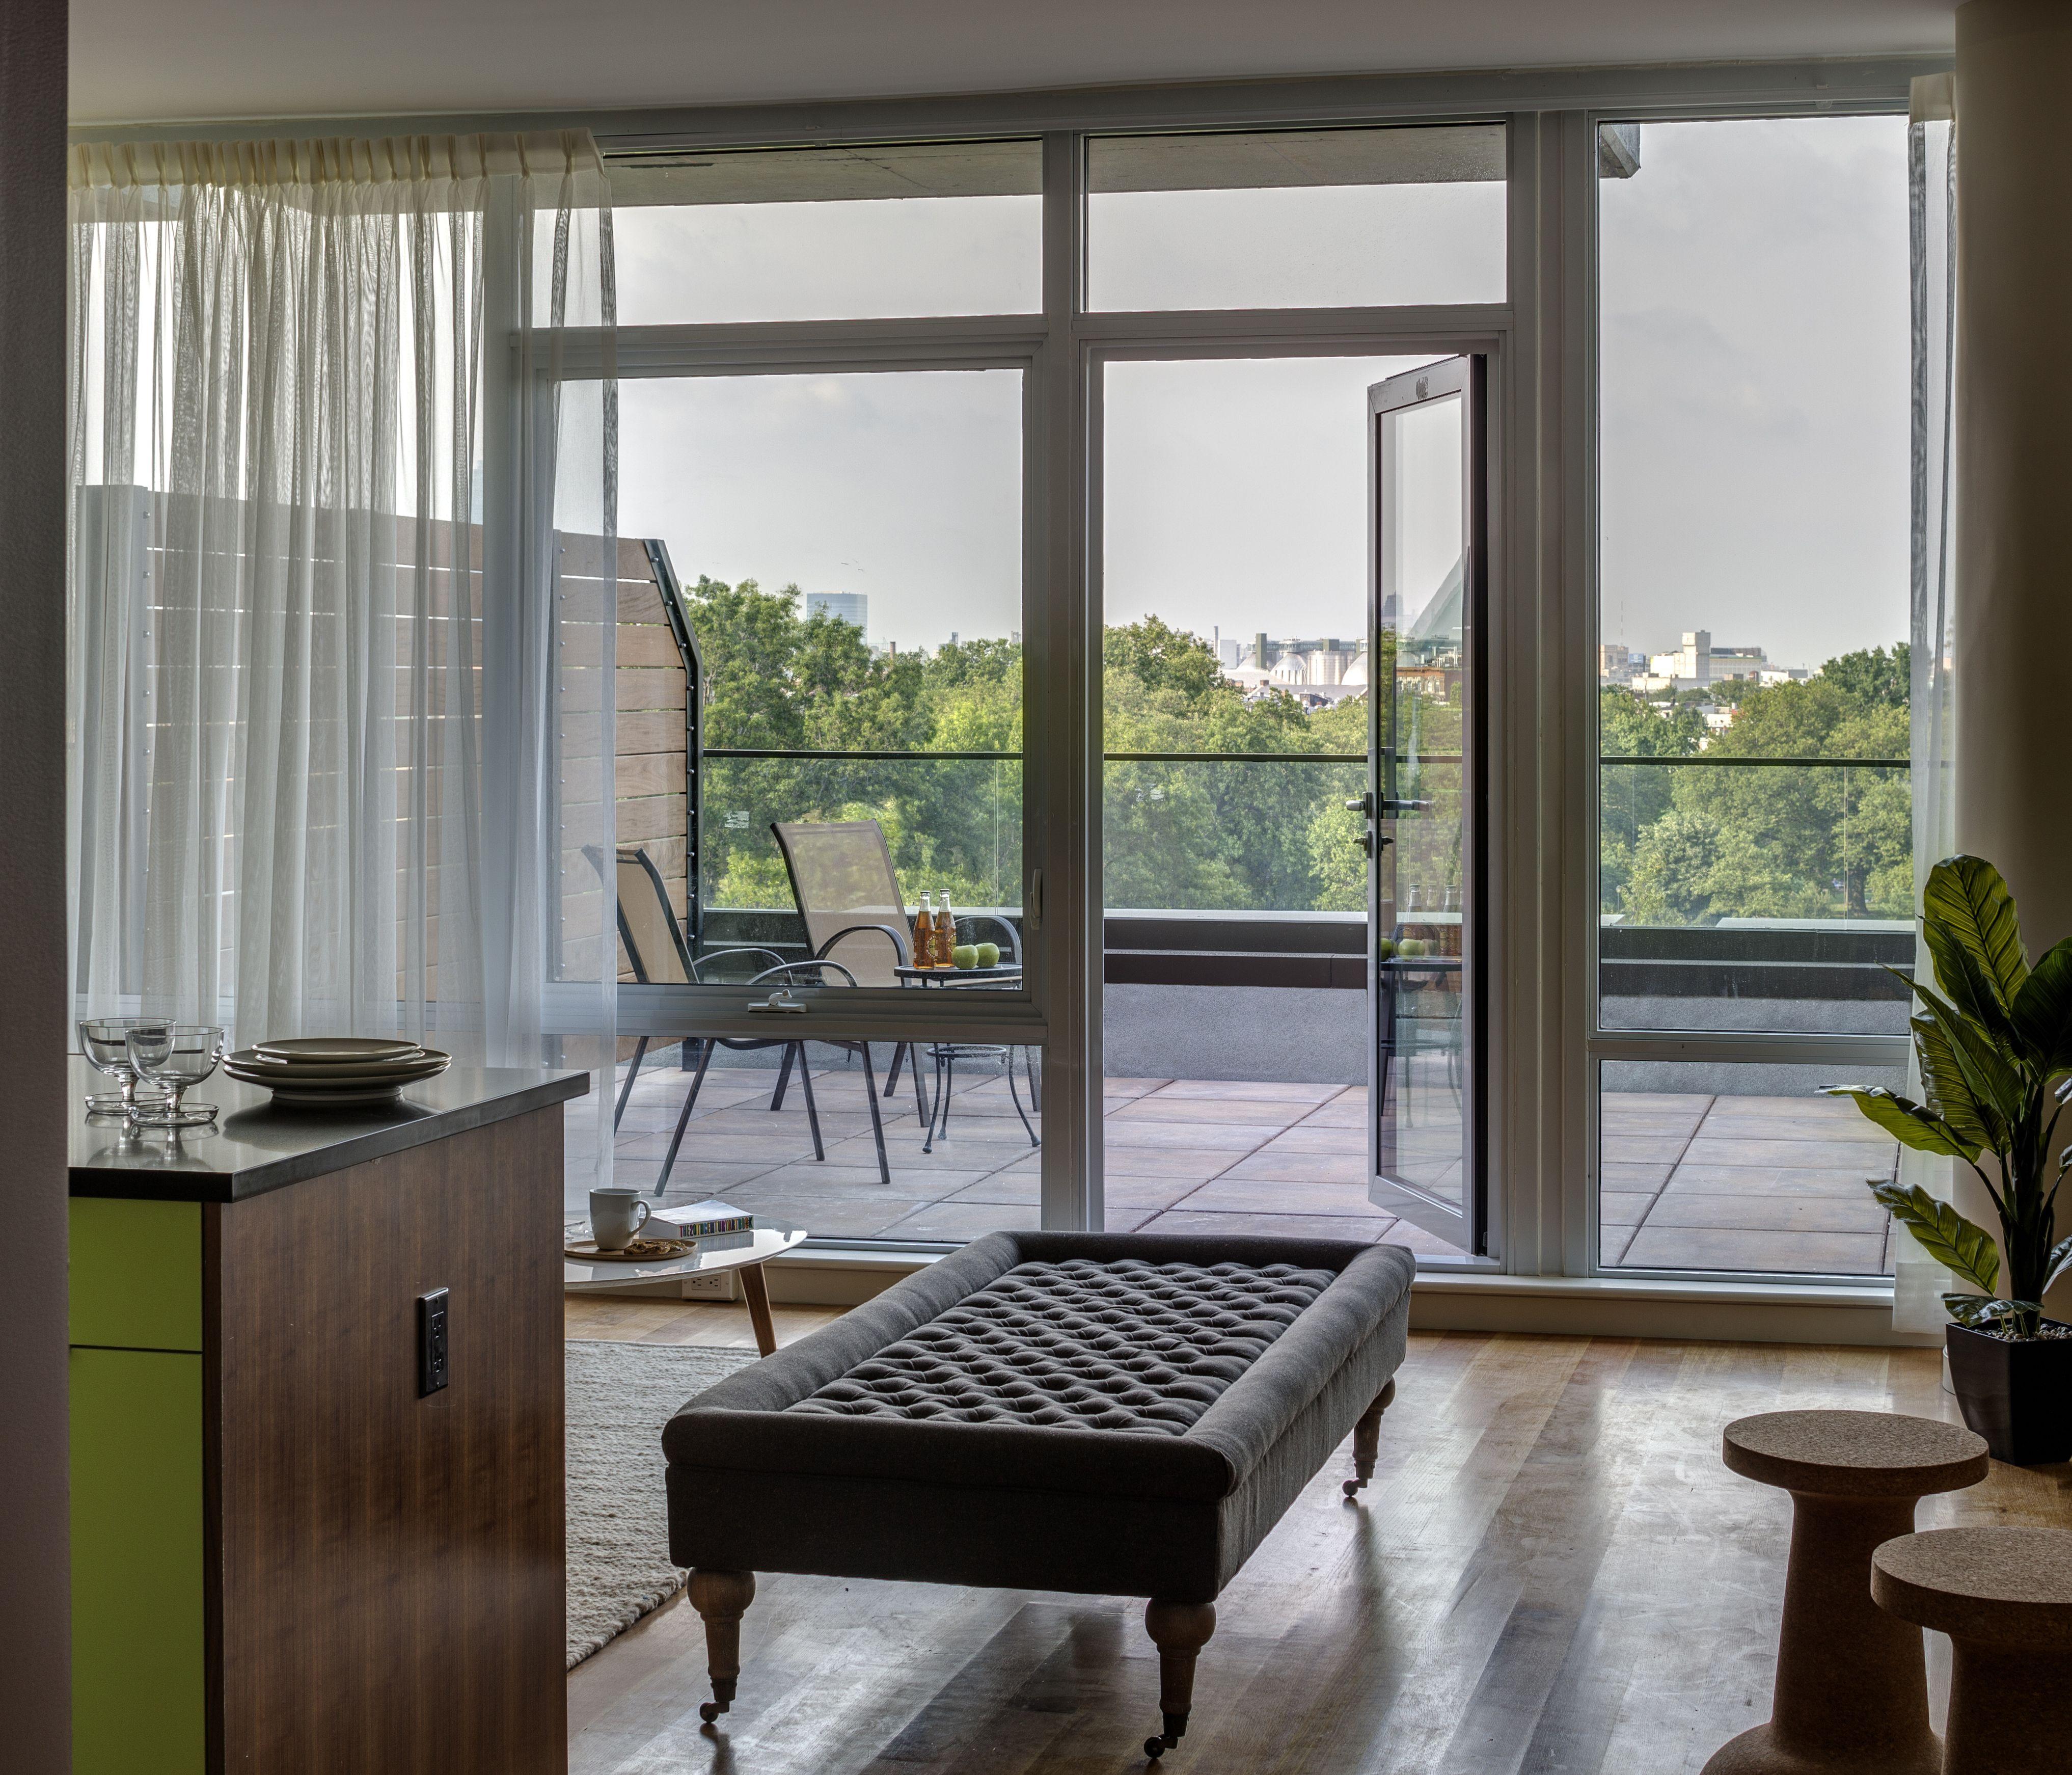 Williamsburg Apartments: Brand New Williamsburg Rentals With Generous Floor Plans